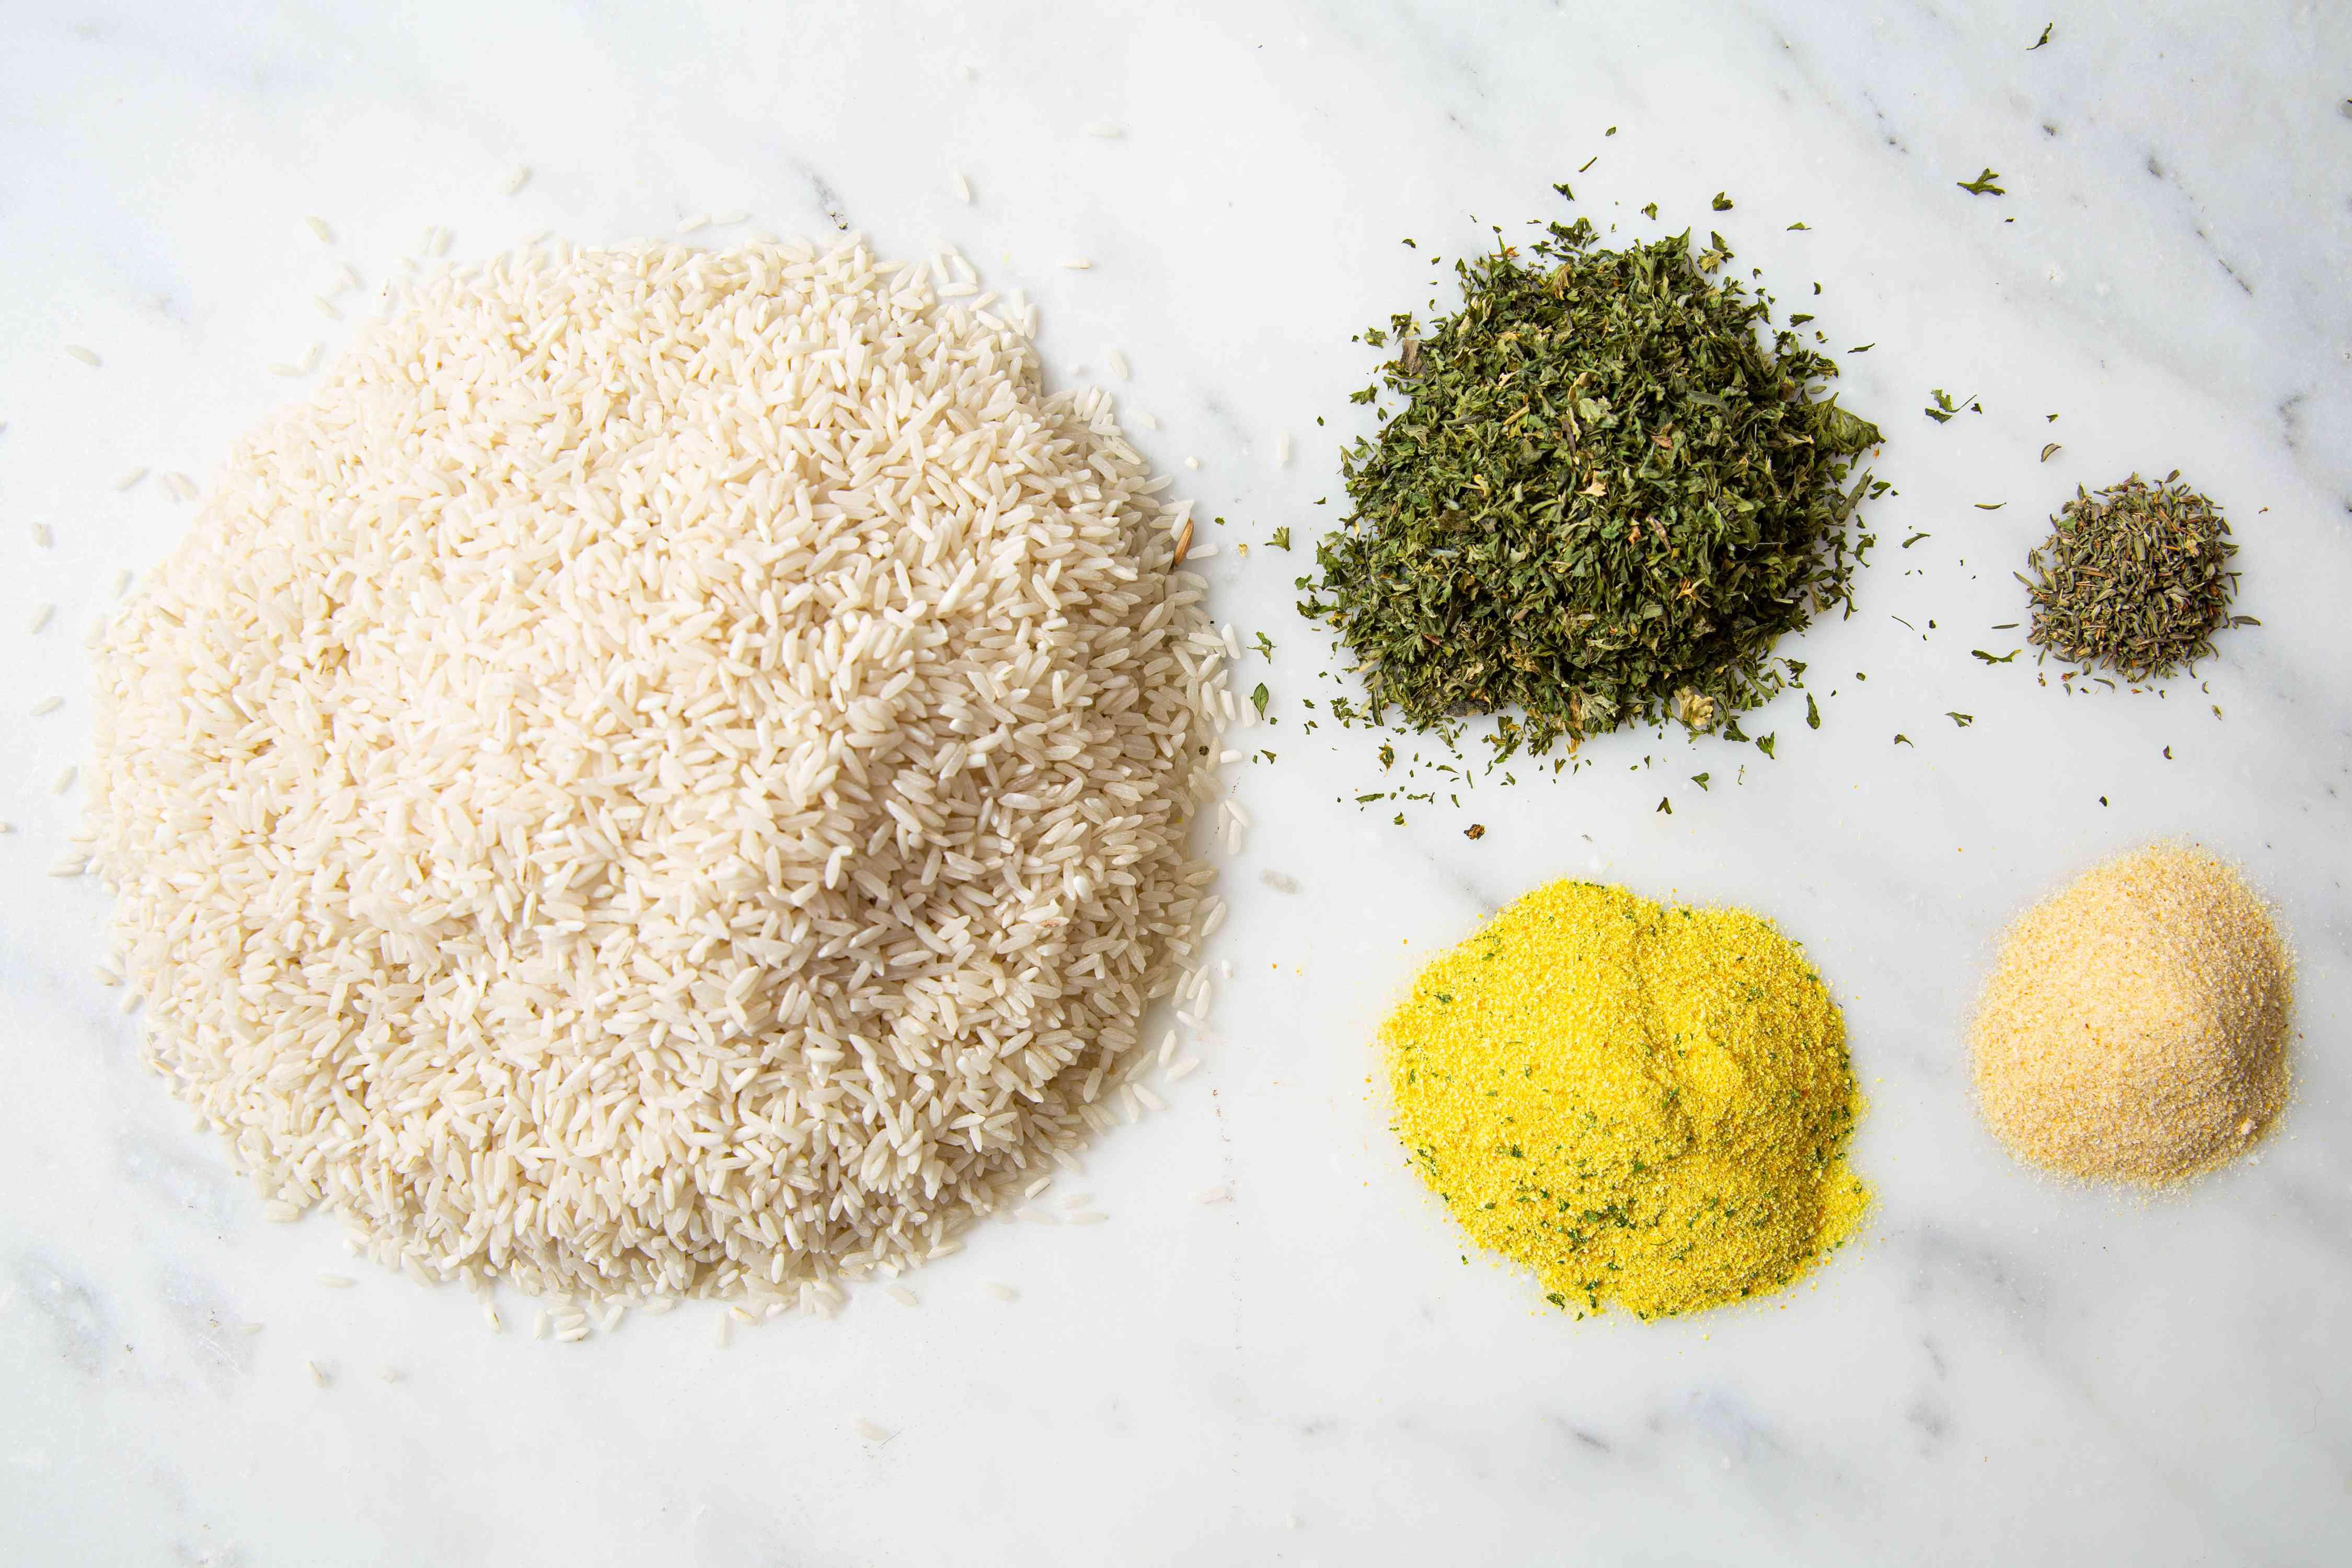 Seasoned Rice Mix ingredients